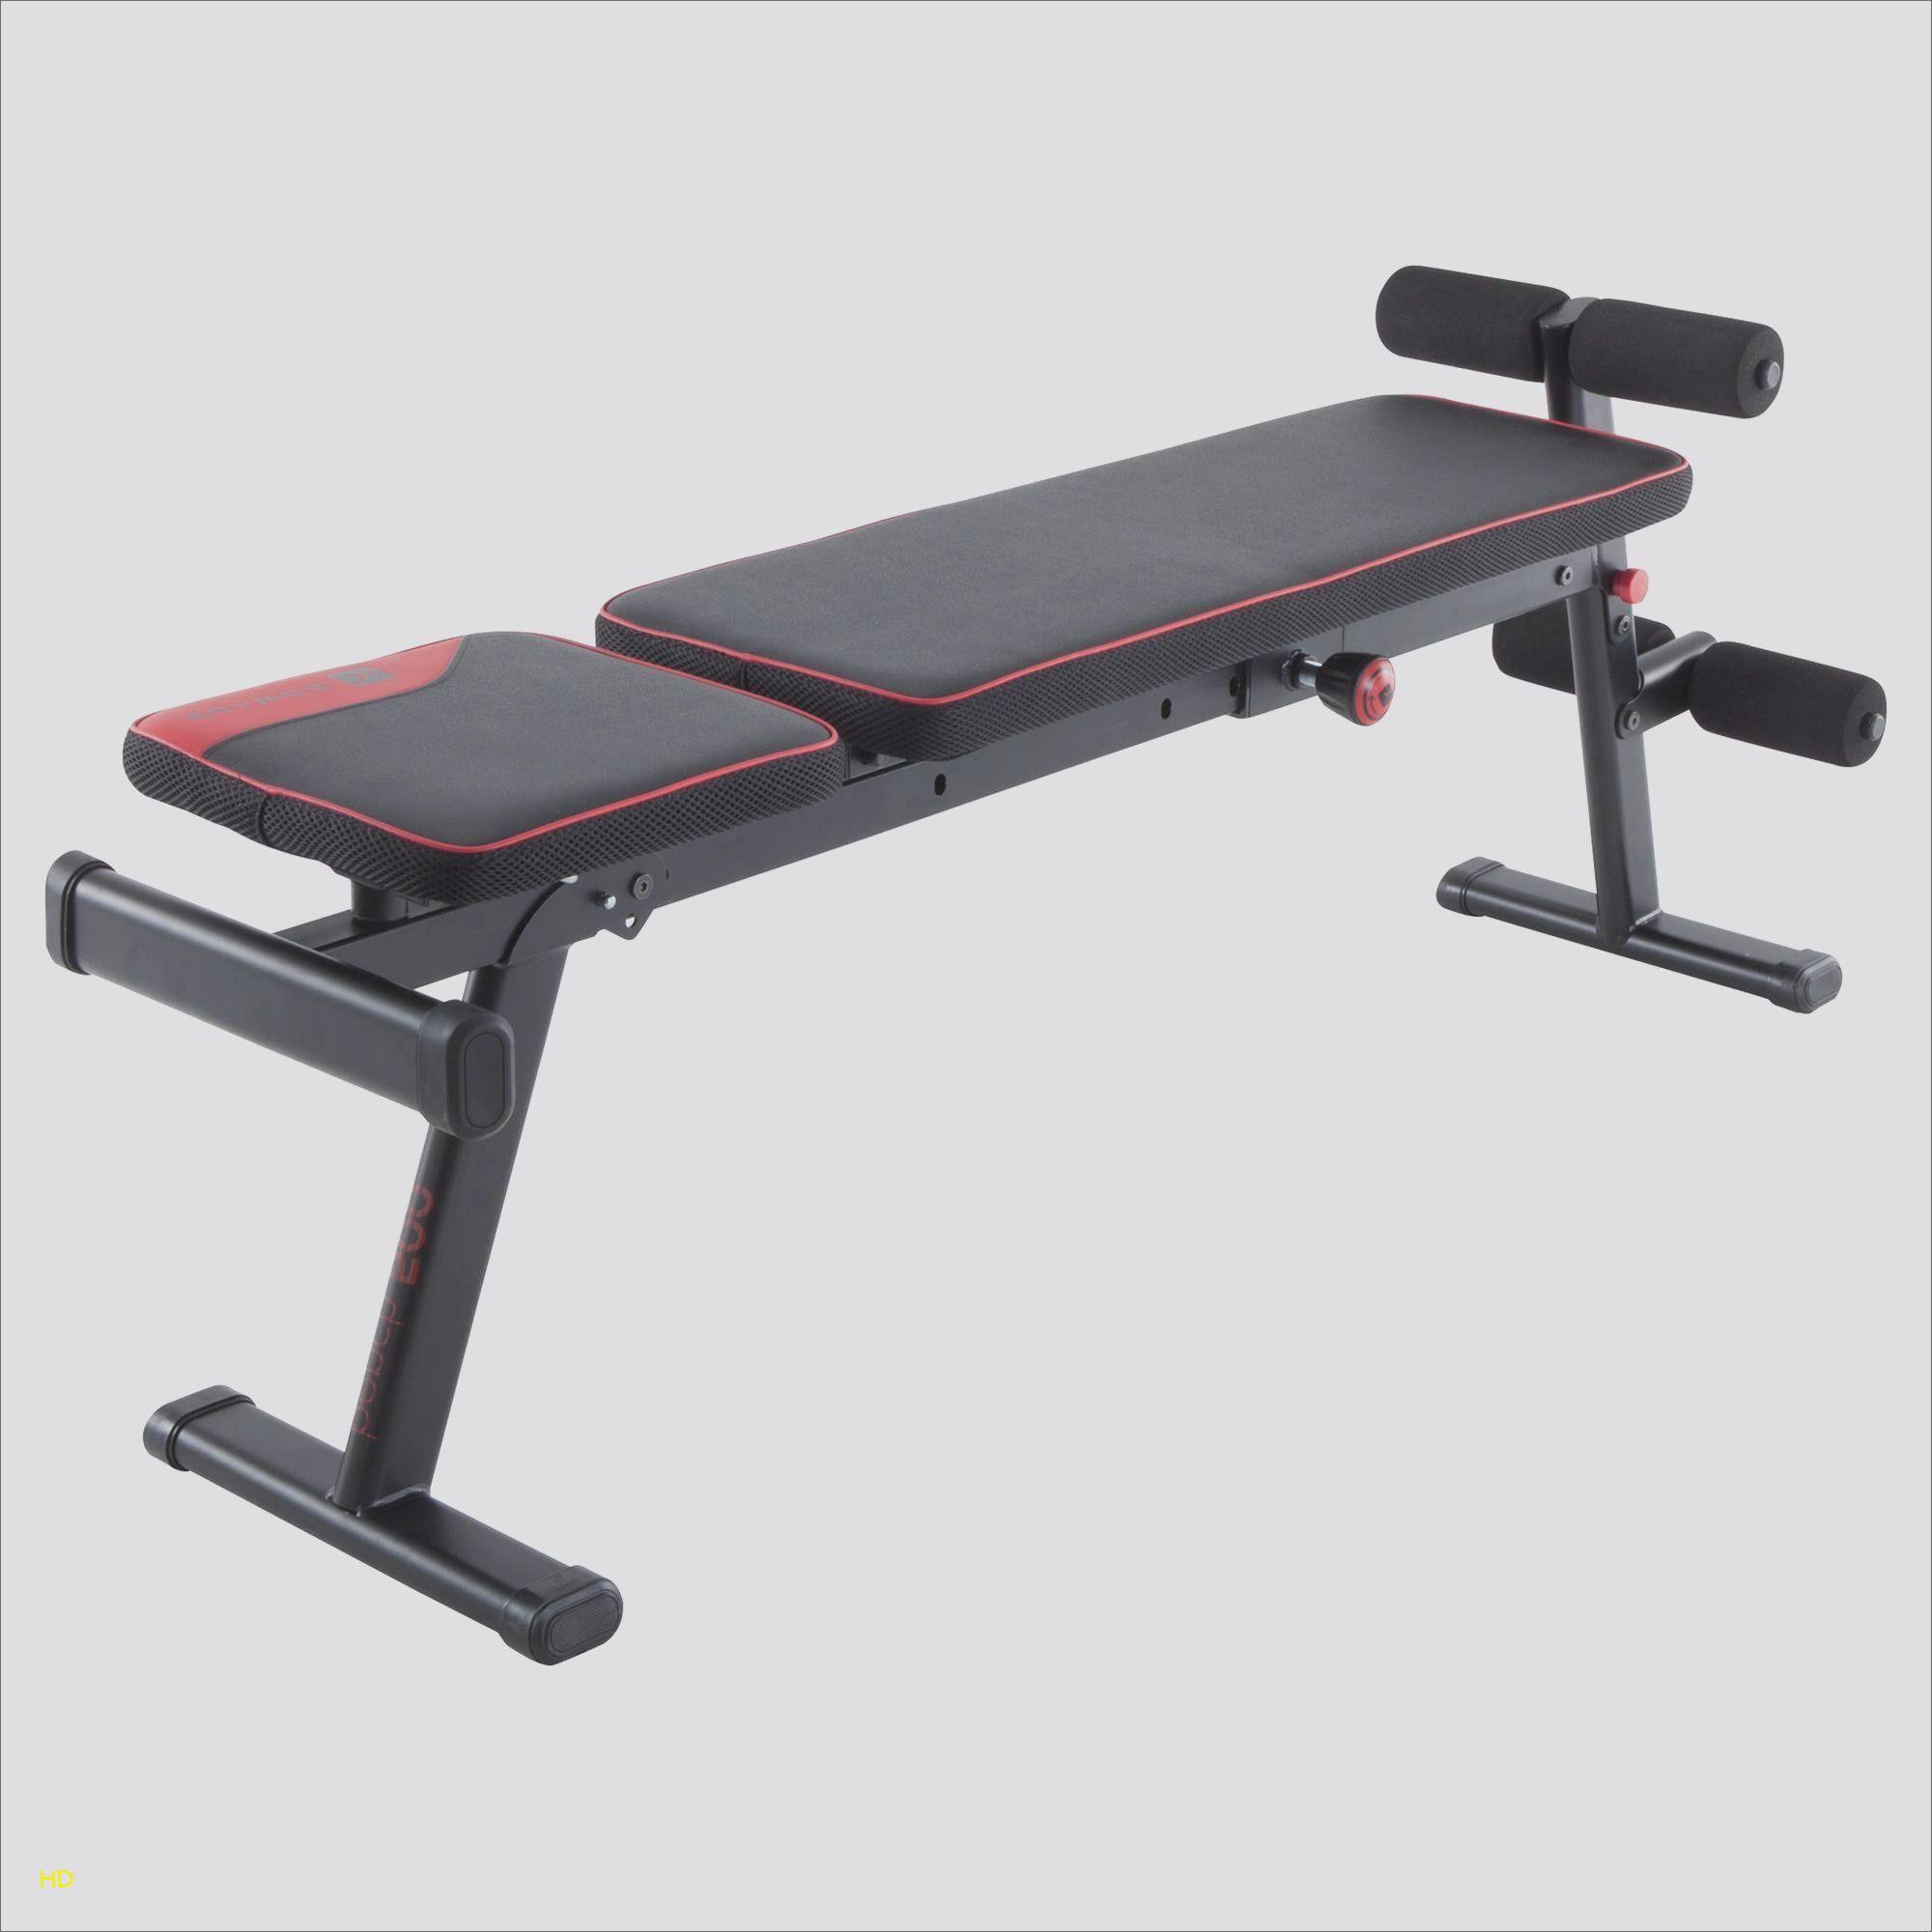 Banc De Musculation Go Sport Banc De Musculation Go Sport Domyos Banc Musculation Unique Table De Musculation Elegant Banc Drafting Desk Gym Equipment Sports